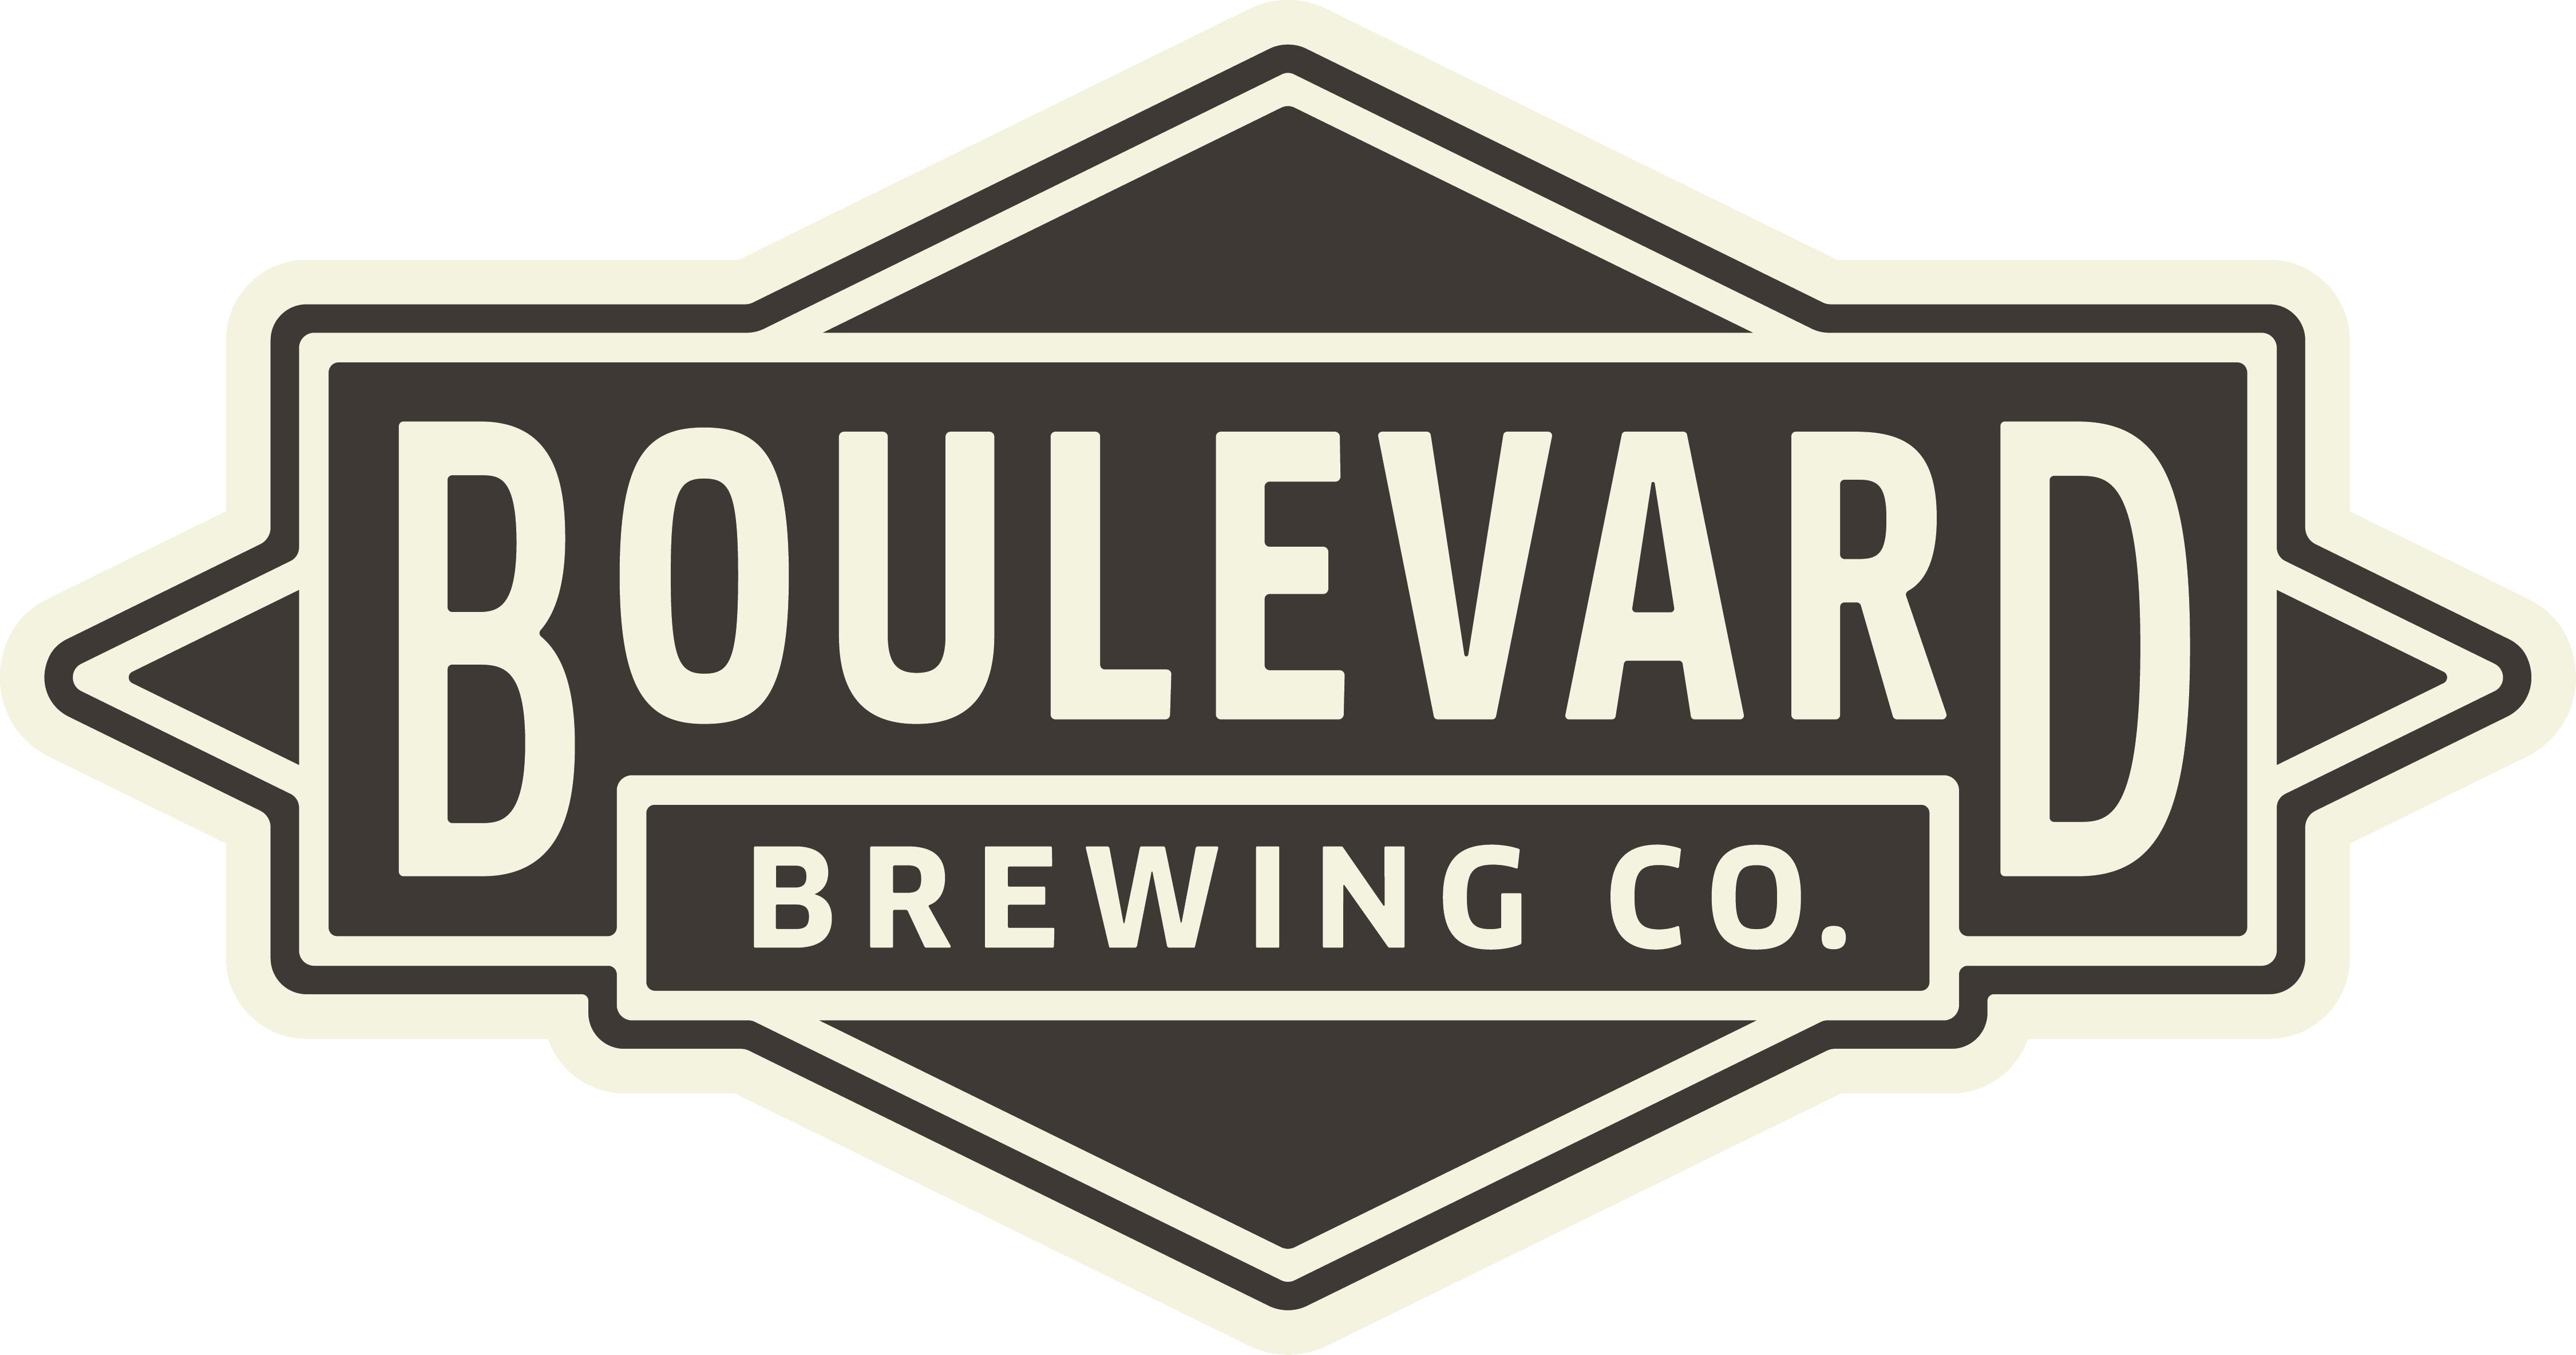 Boulevard Brewing Co.